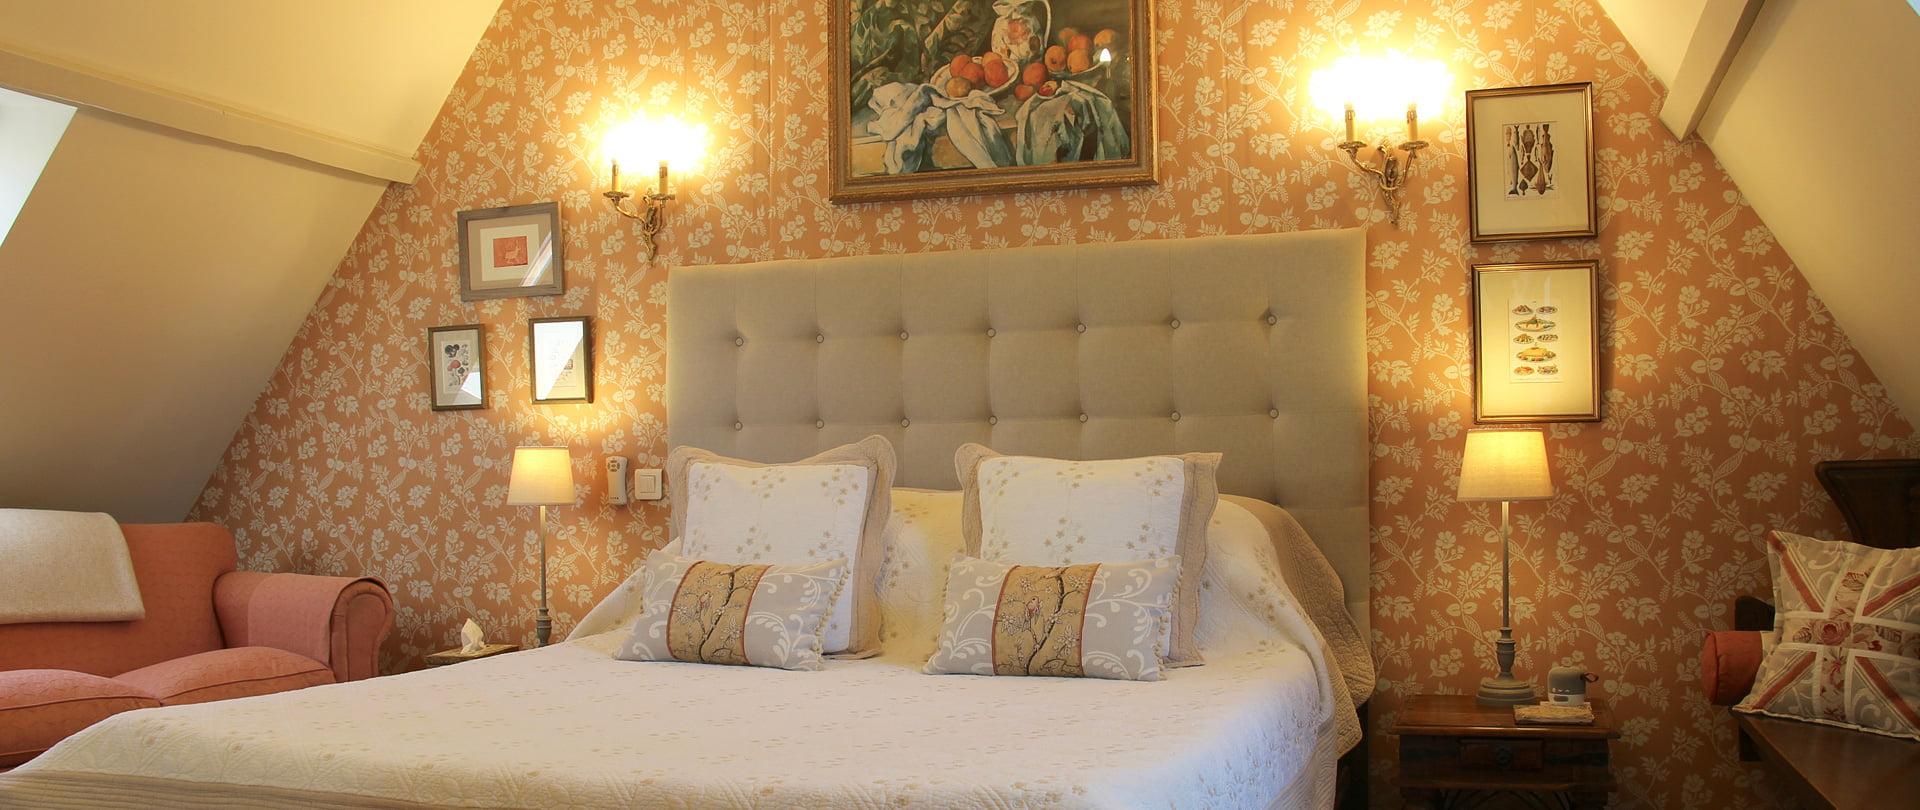 Degas Bedroom